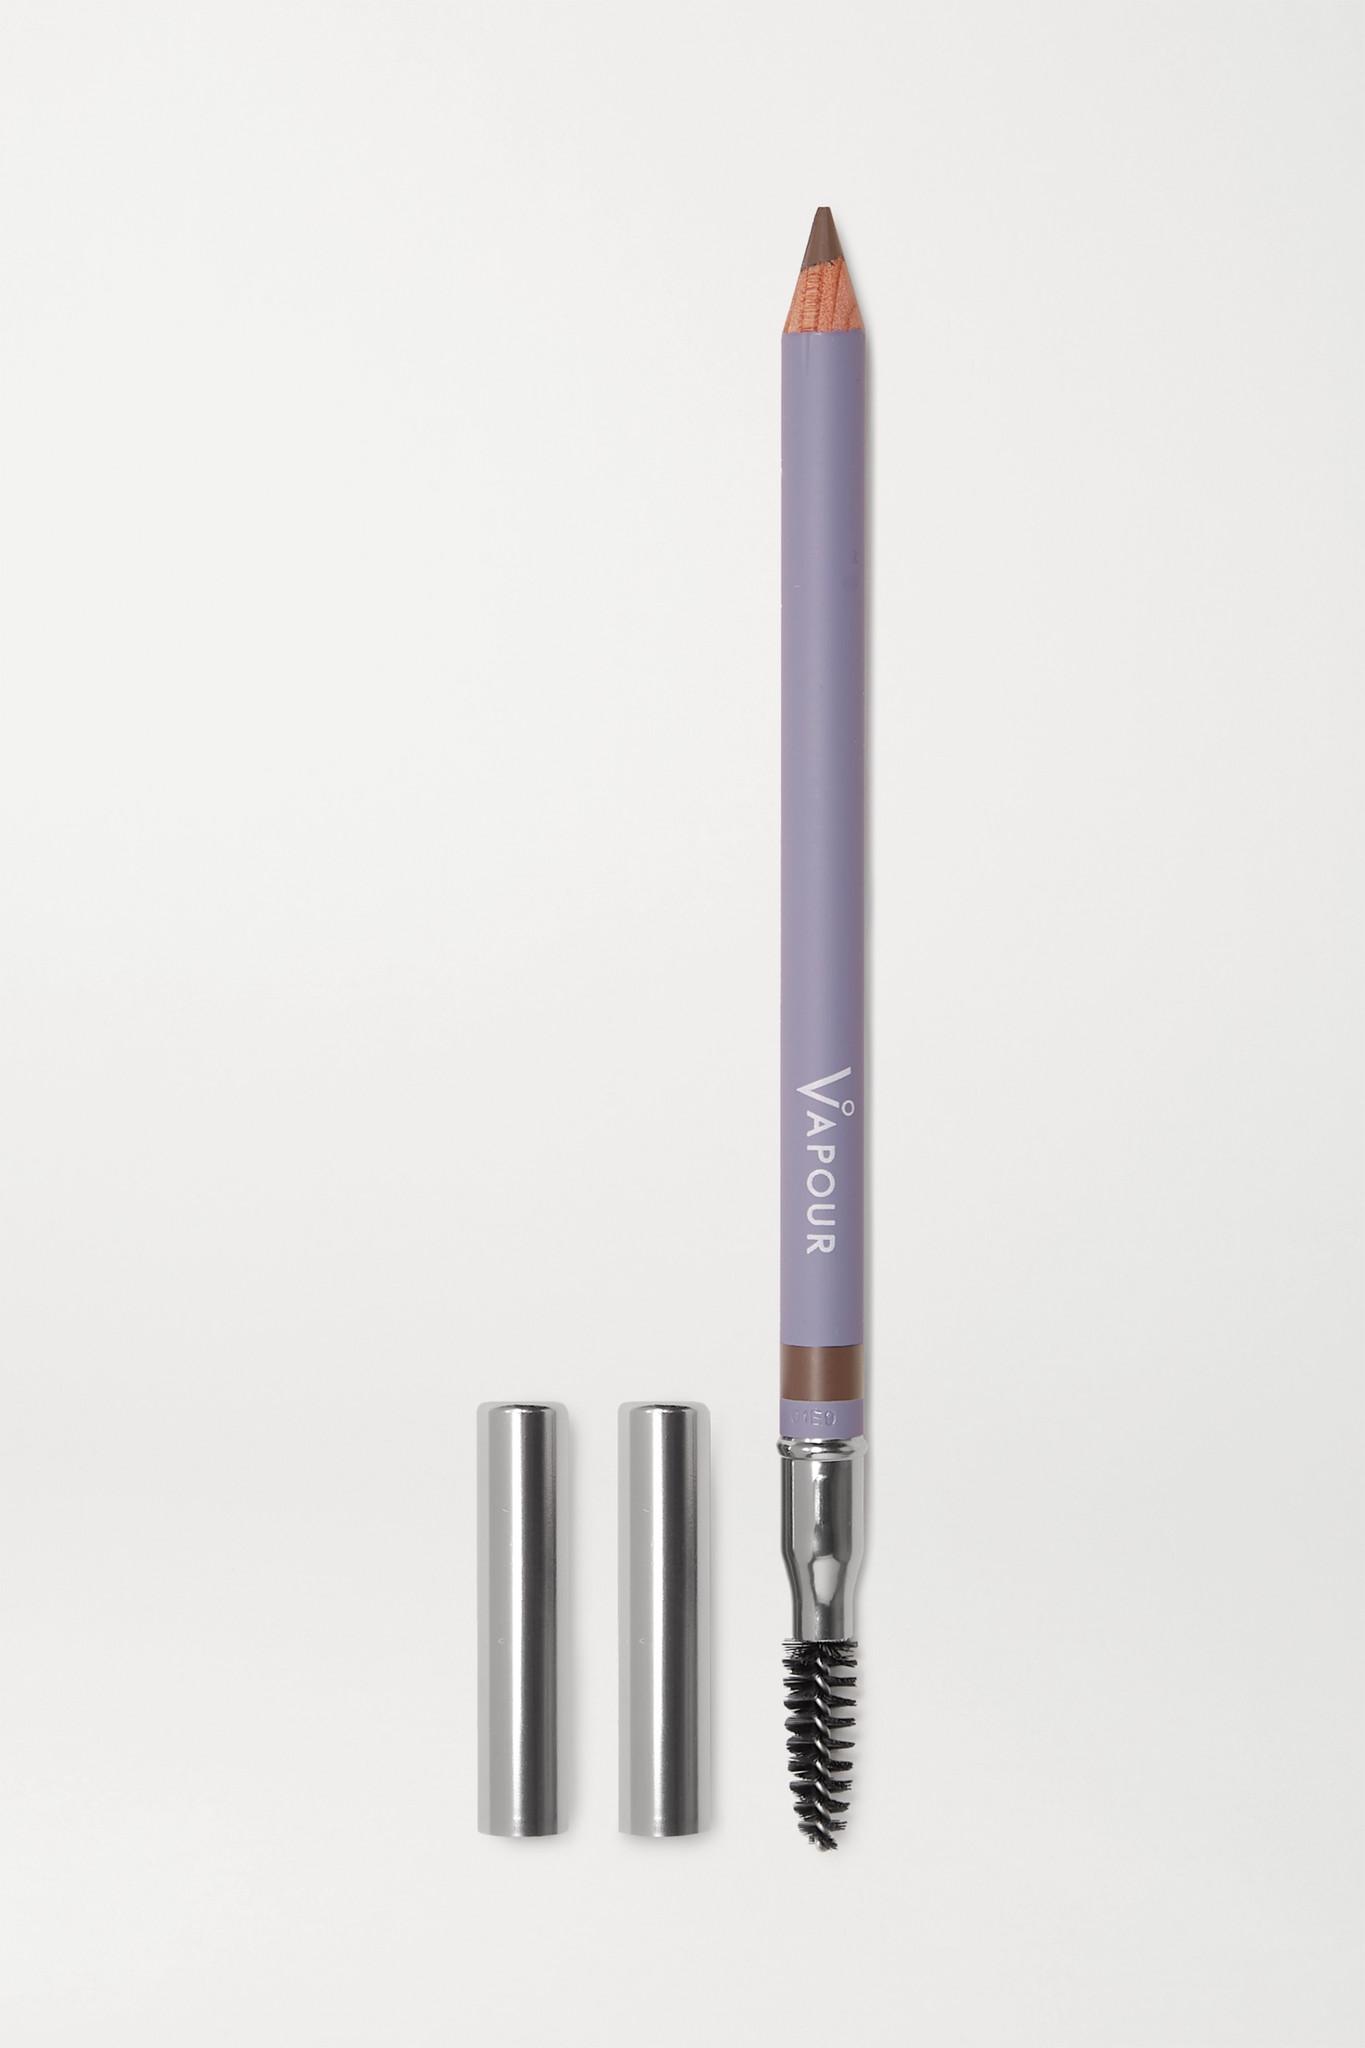 VAPOUR BEAUTY - Brow Definer - Dusk - Brown - one size